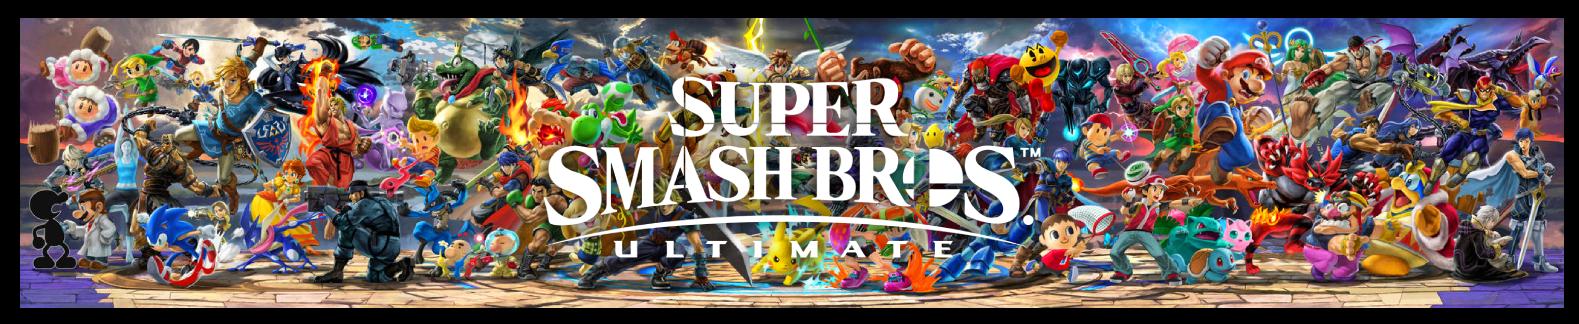 Super Smash Bros  Ultimate Forum - Super Smash Bros